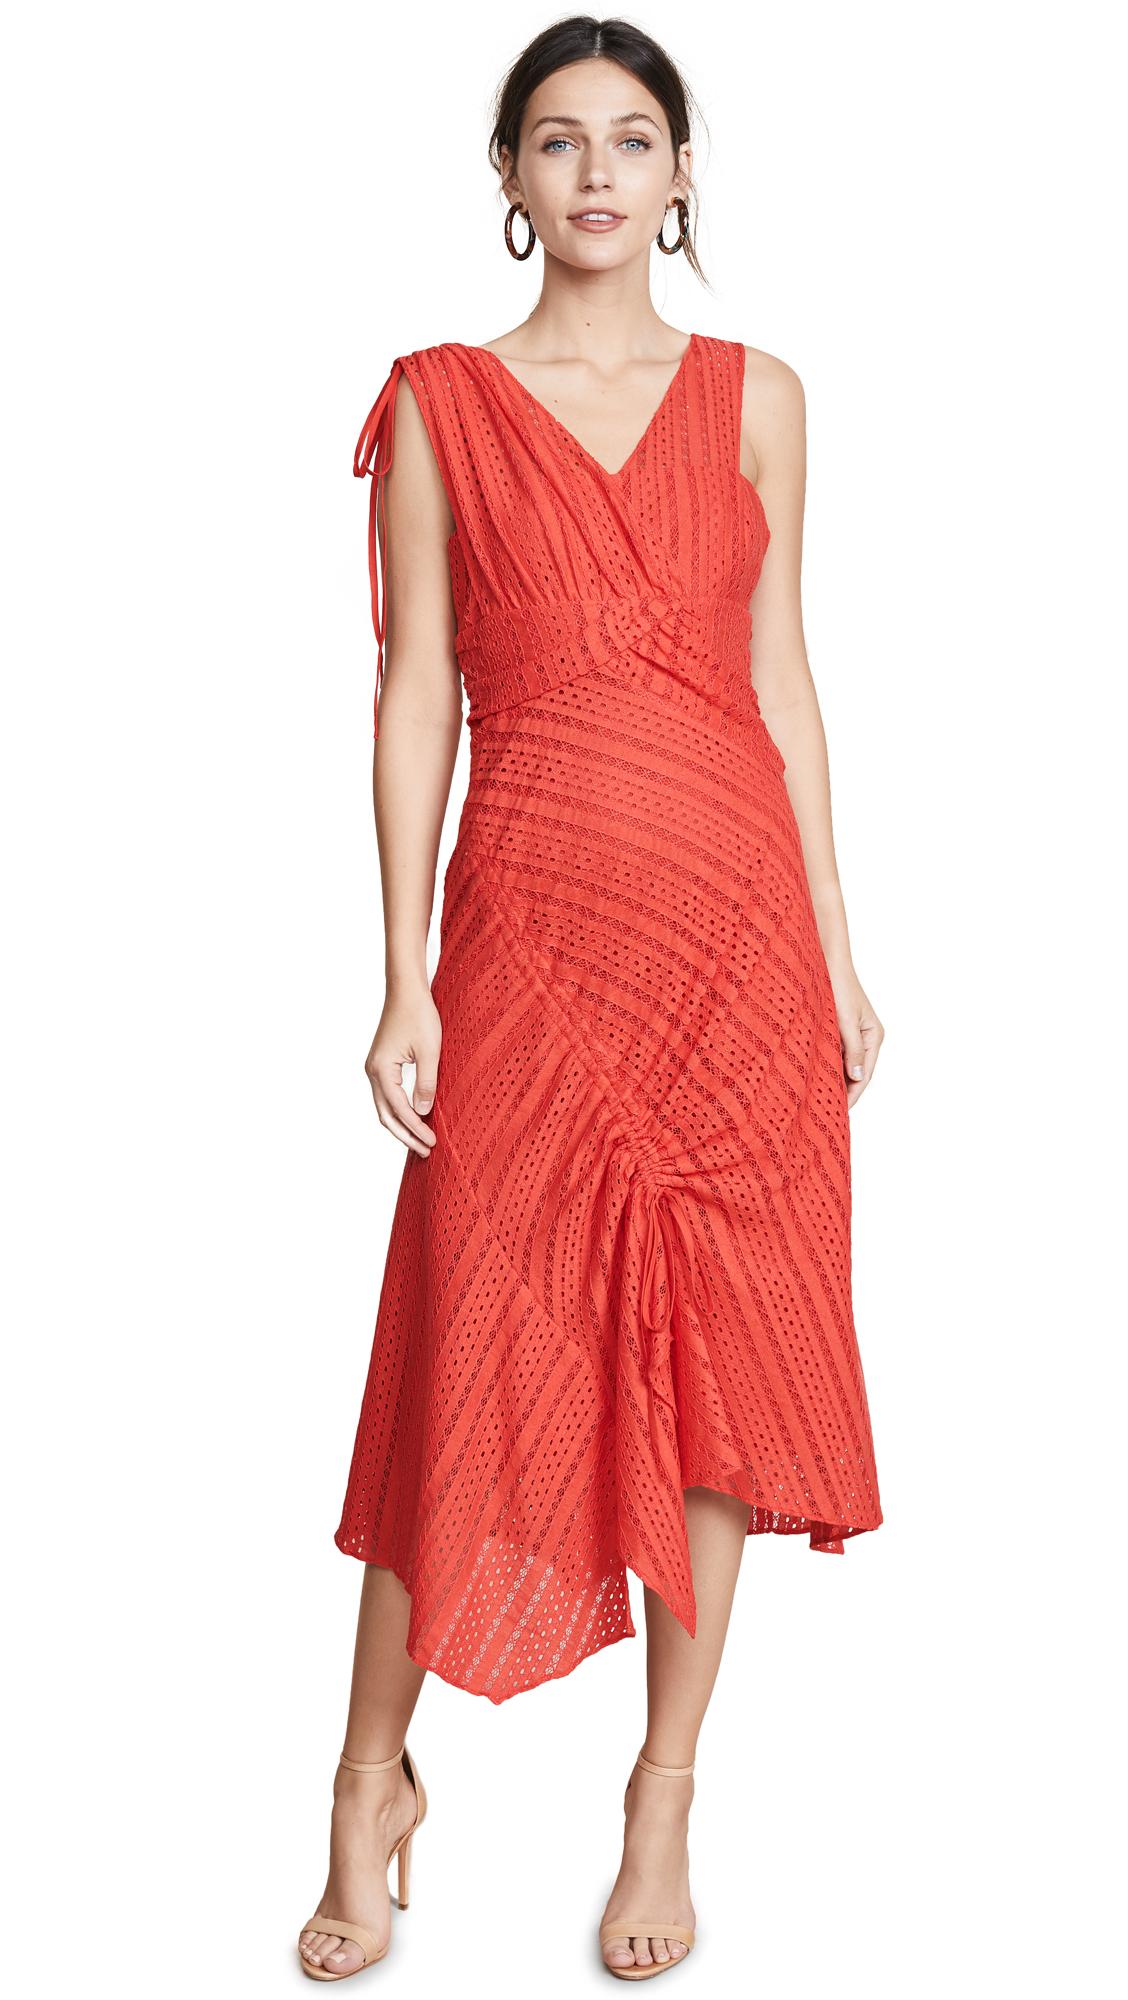 Tanya Taylor Juliet Dress In Red